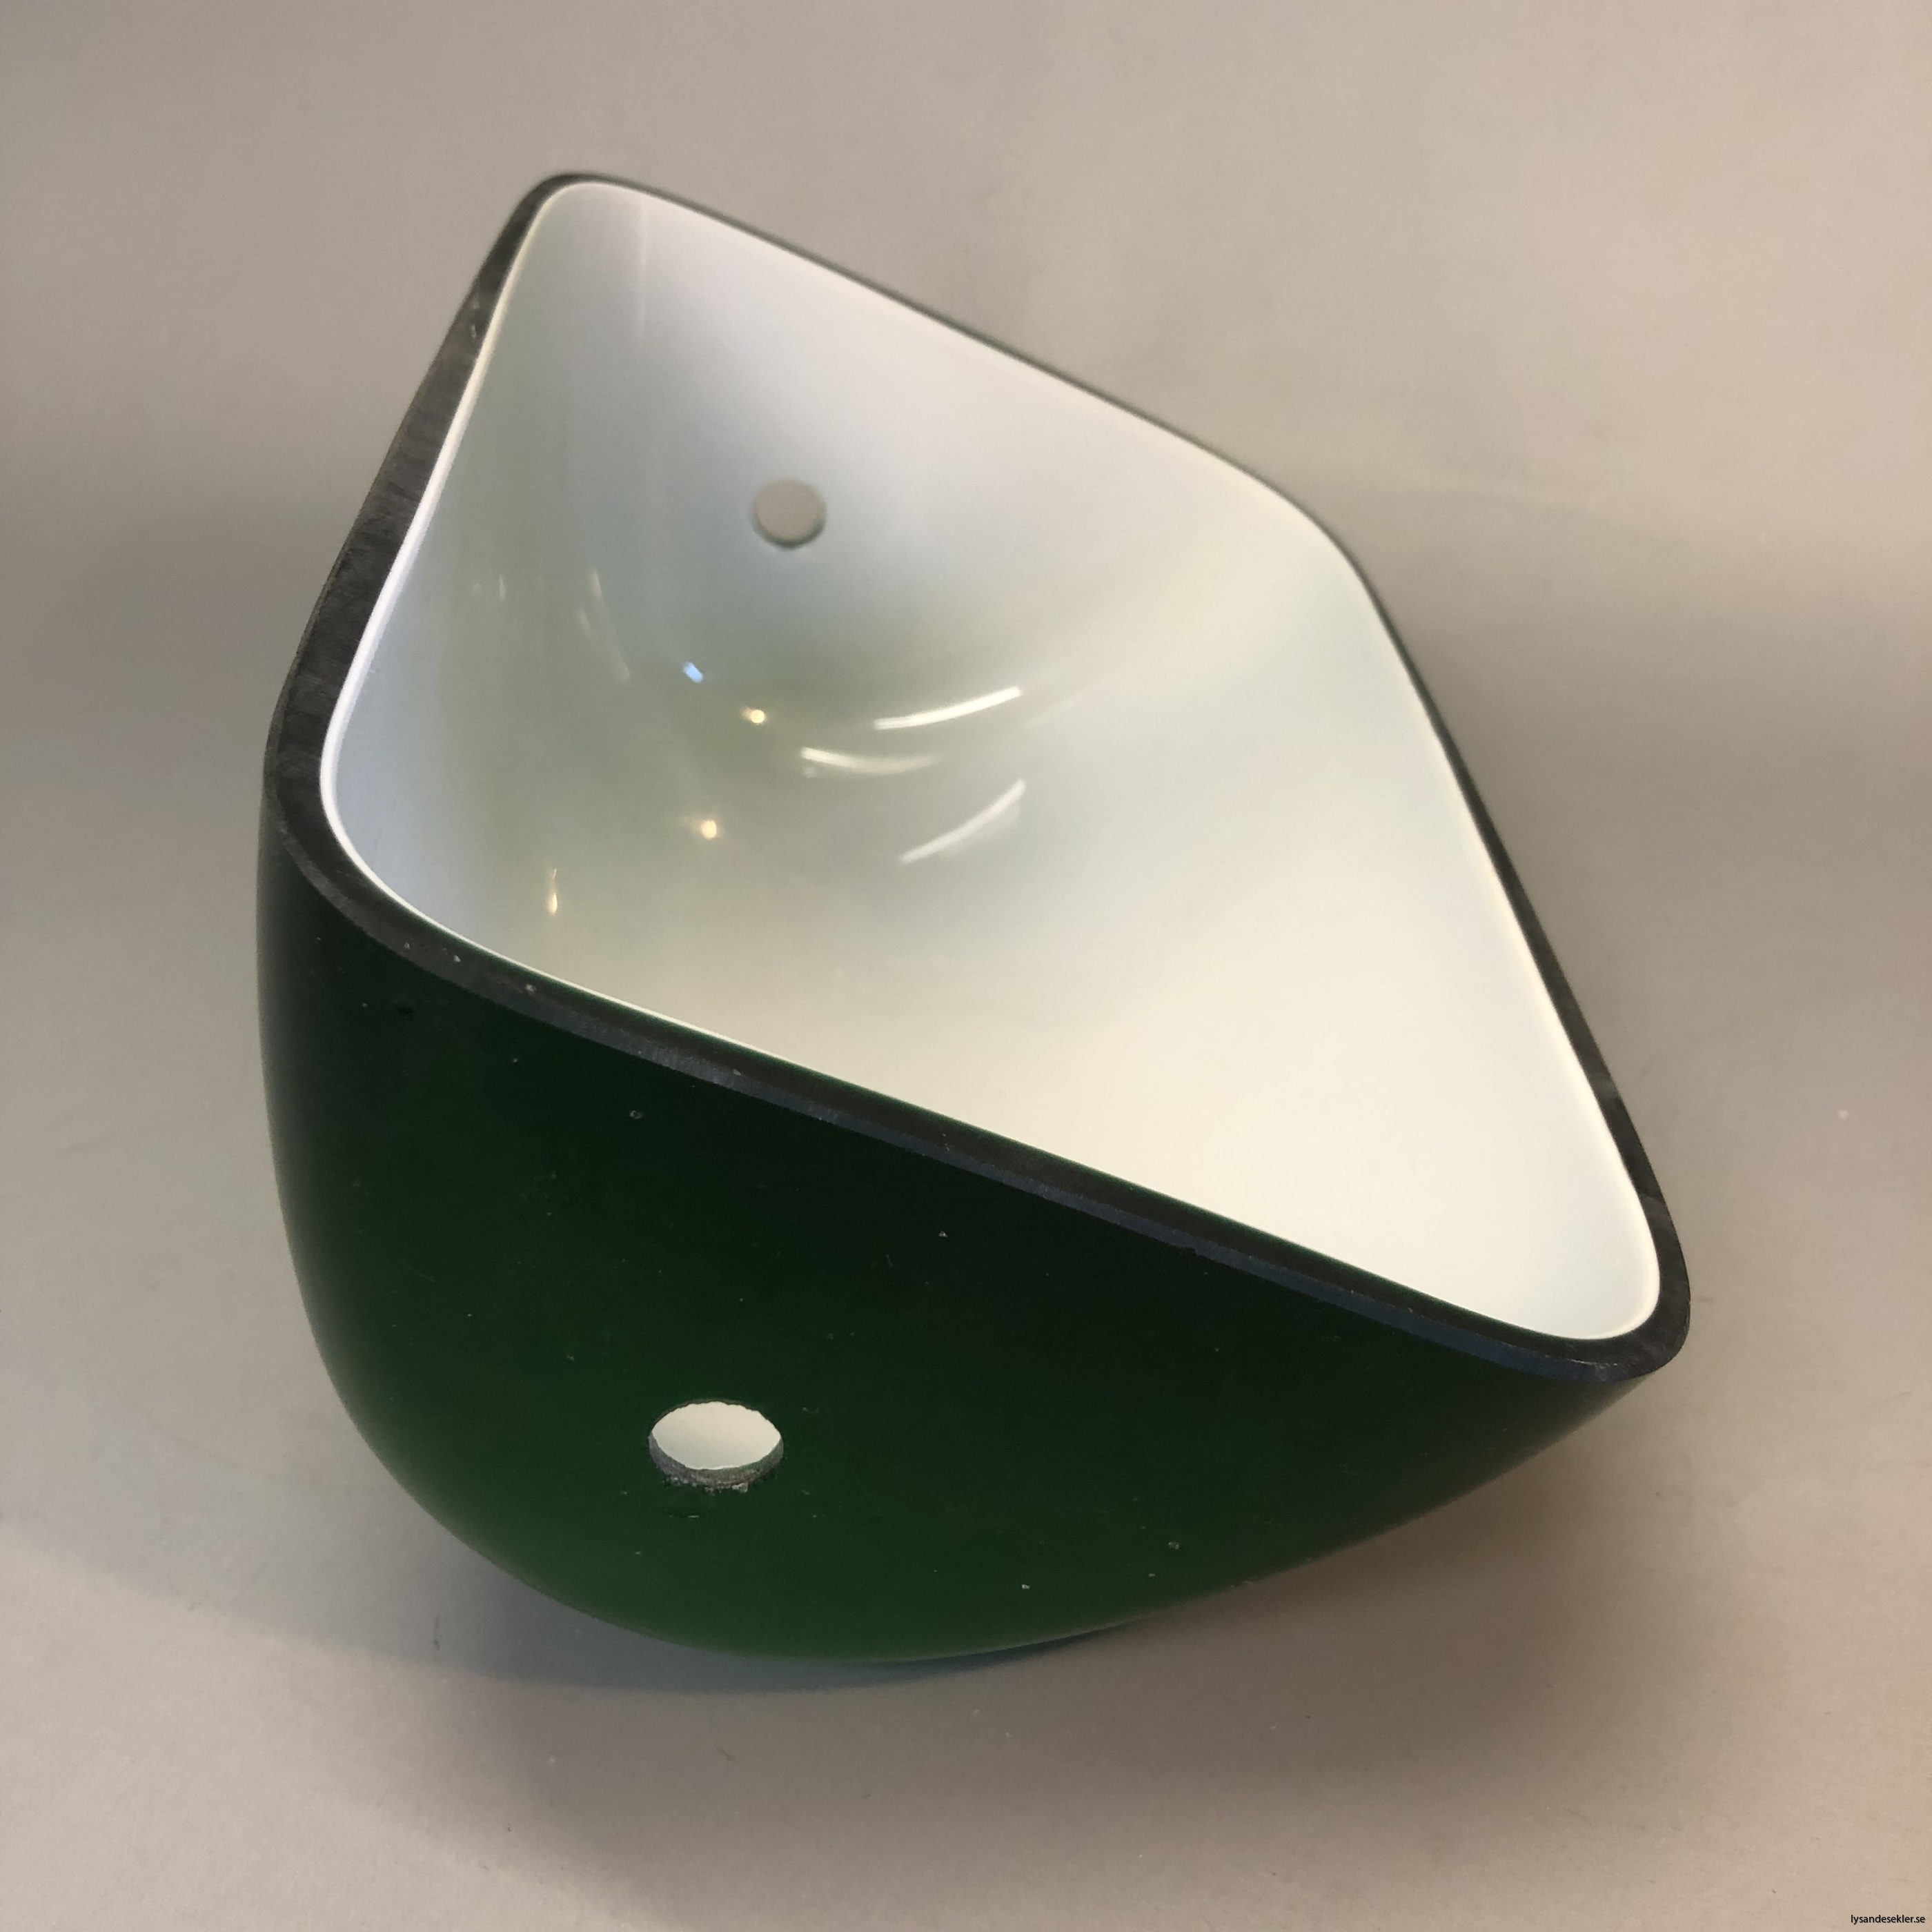 reservglas bankirlampa bibliotekslampa amerikalampa grönt lampglas gult reservglas extraglas10